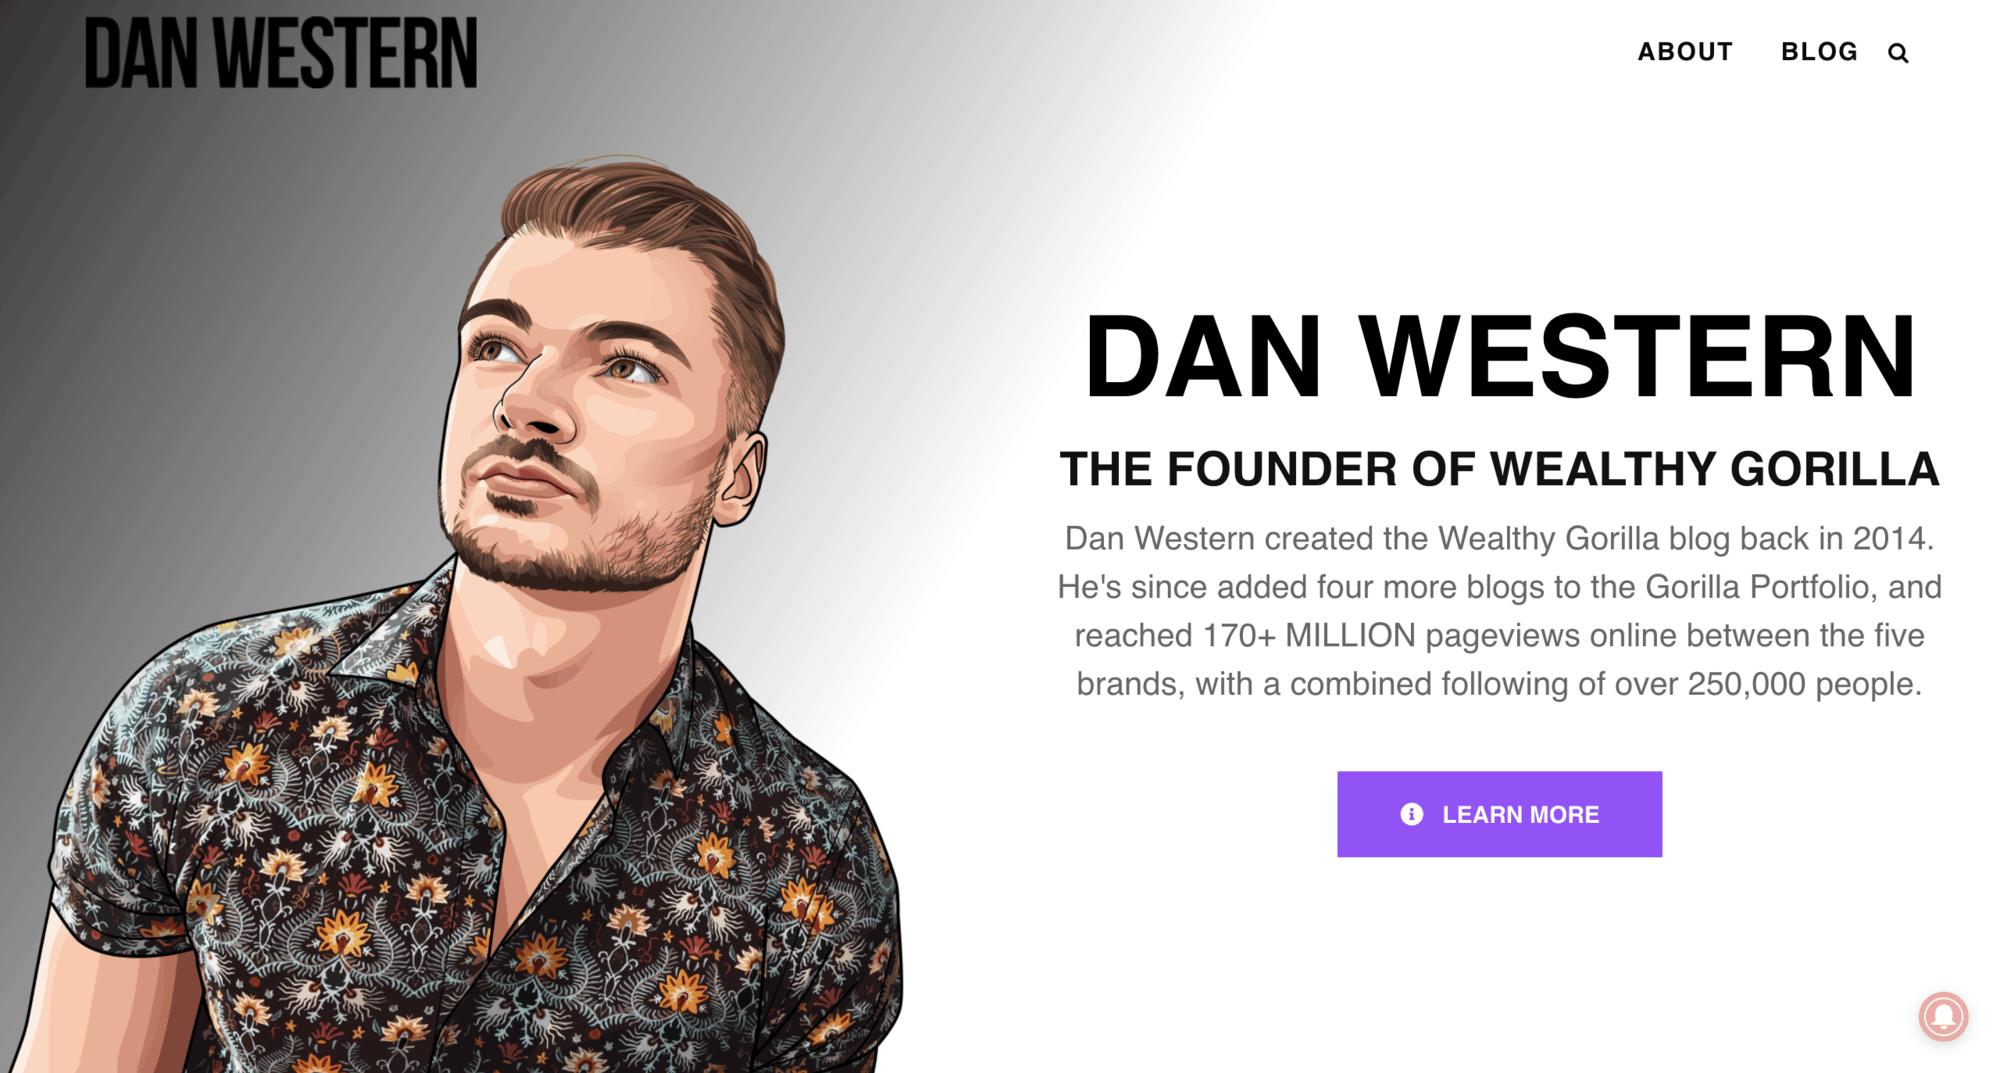 DanWestern.com